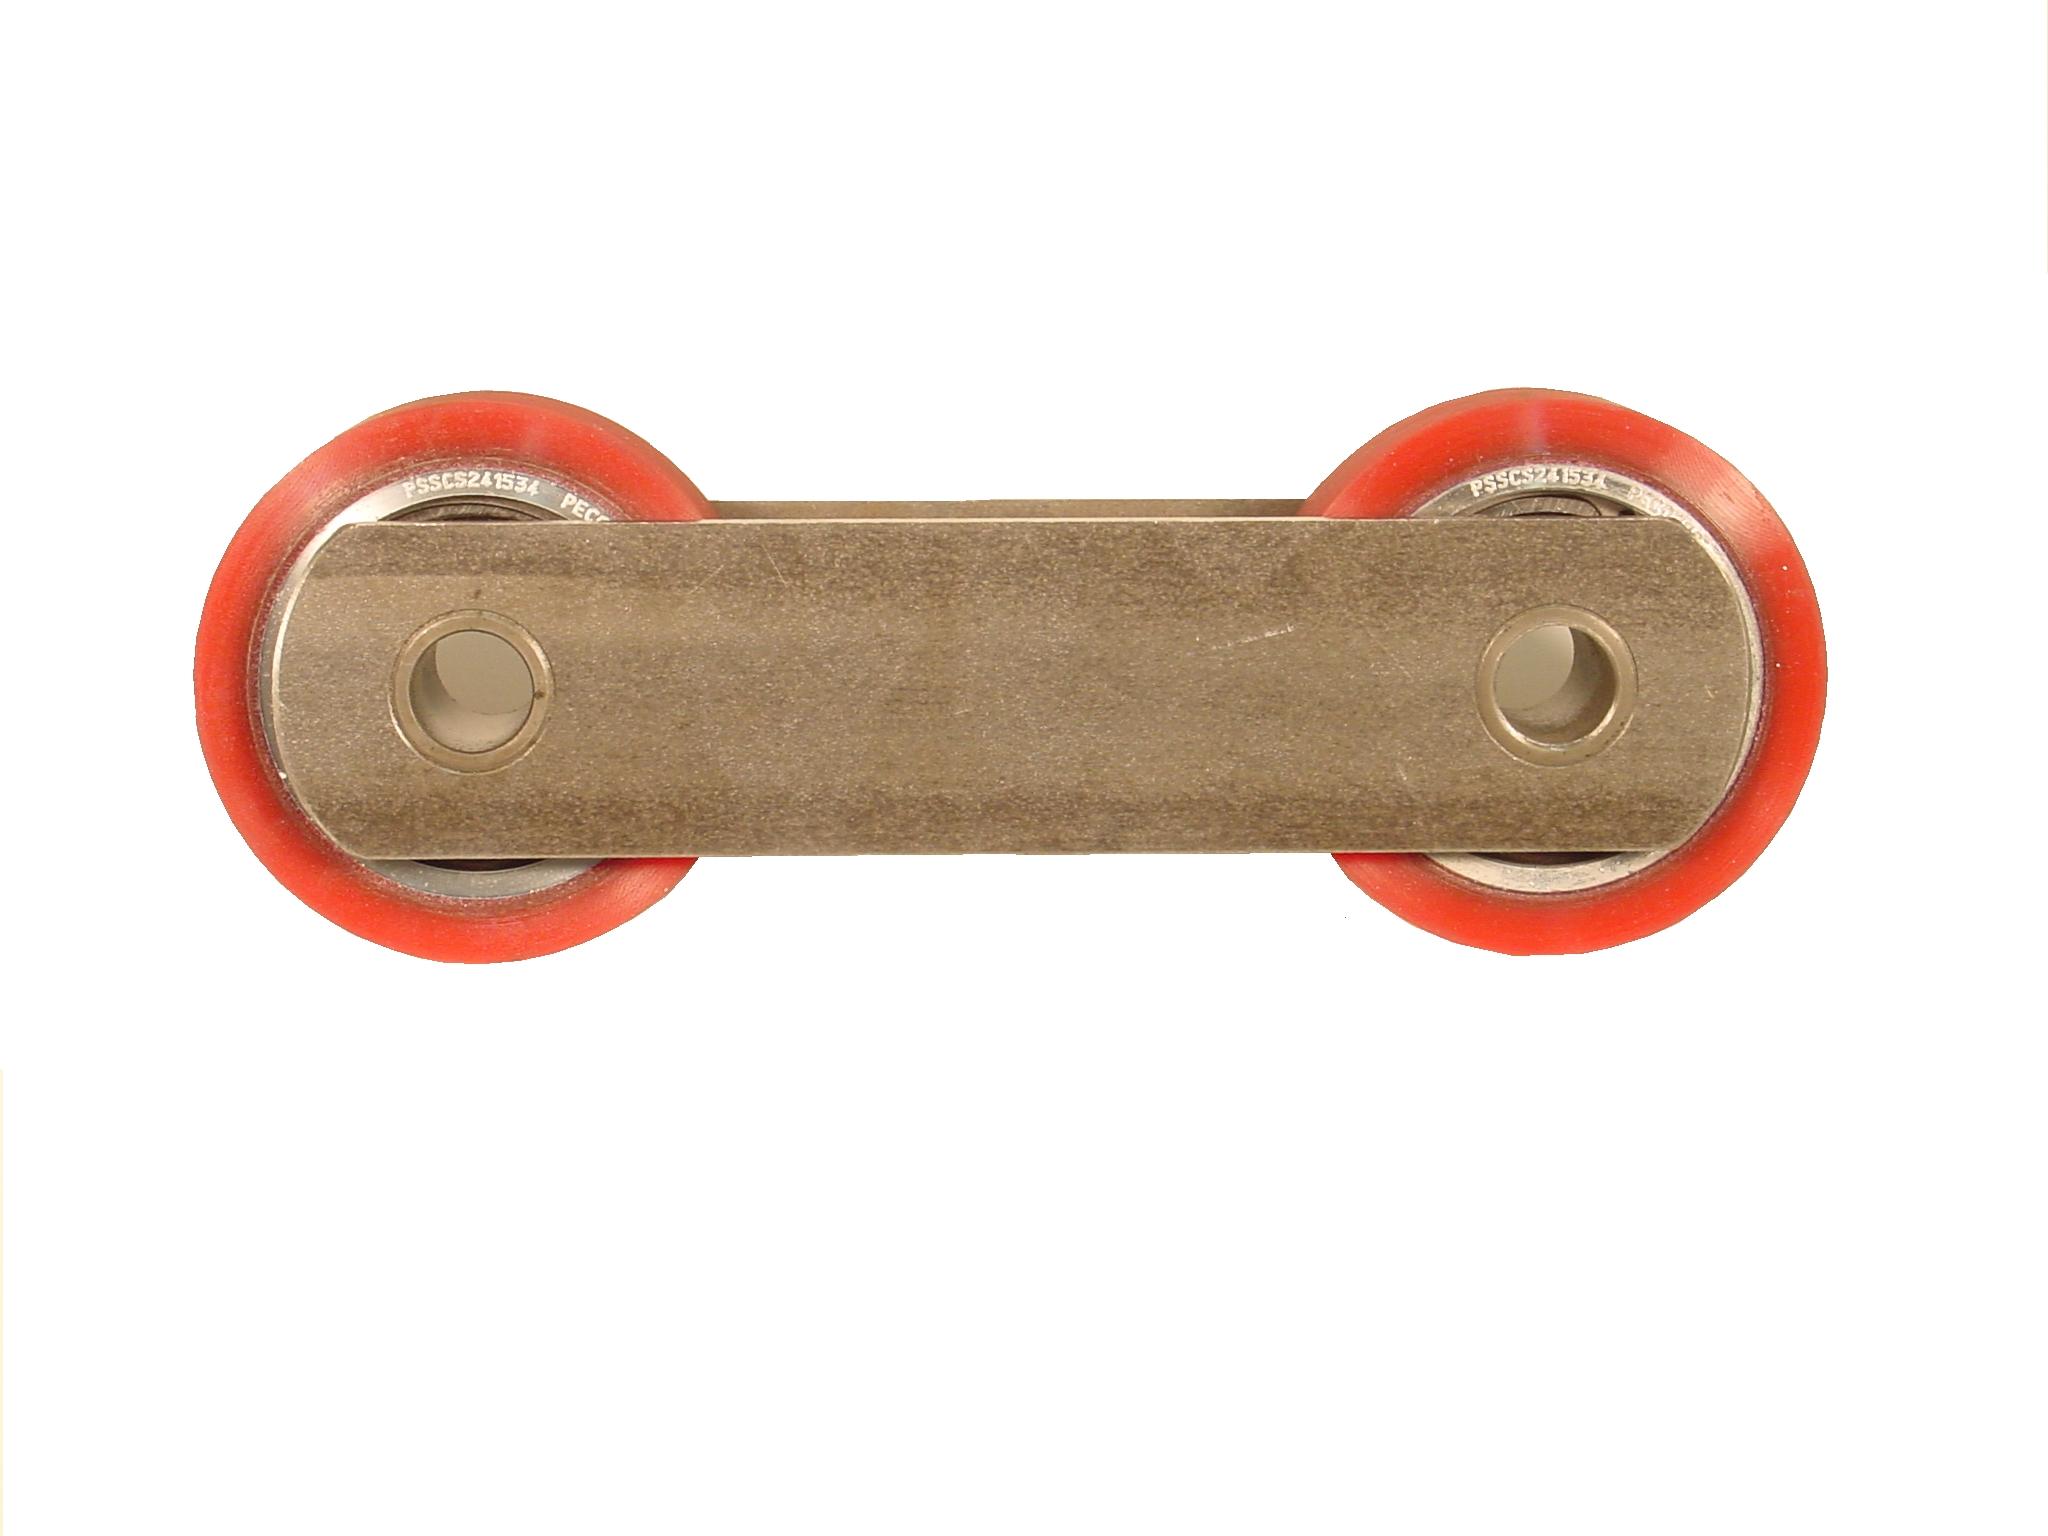 sch-roller-link